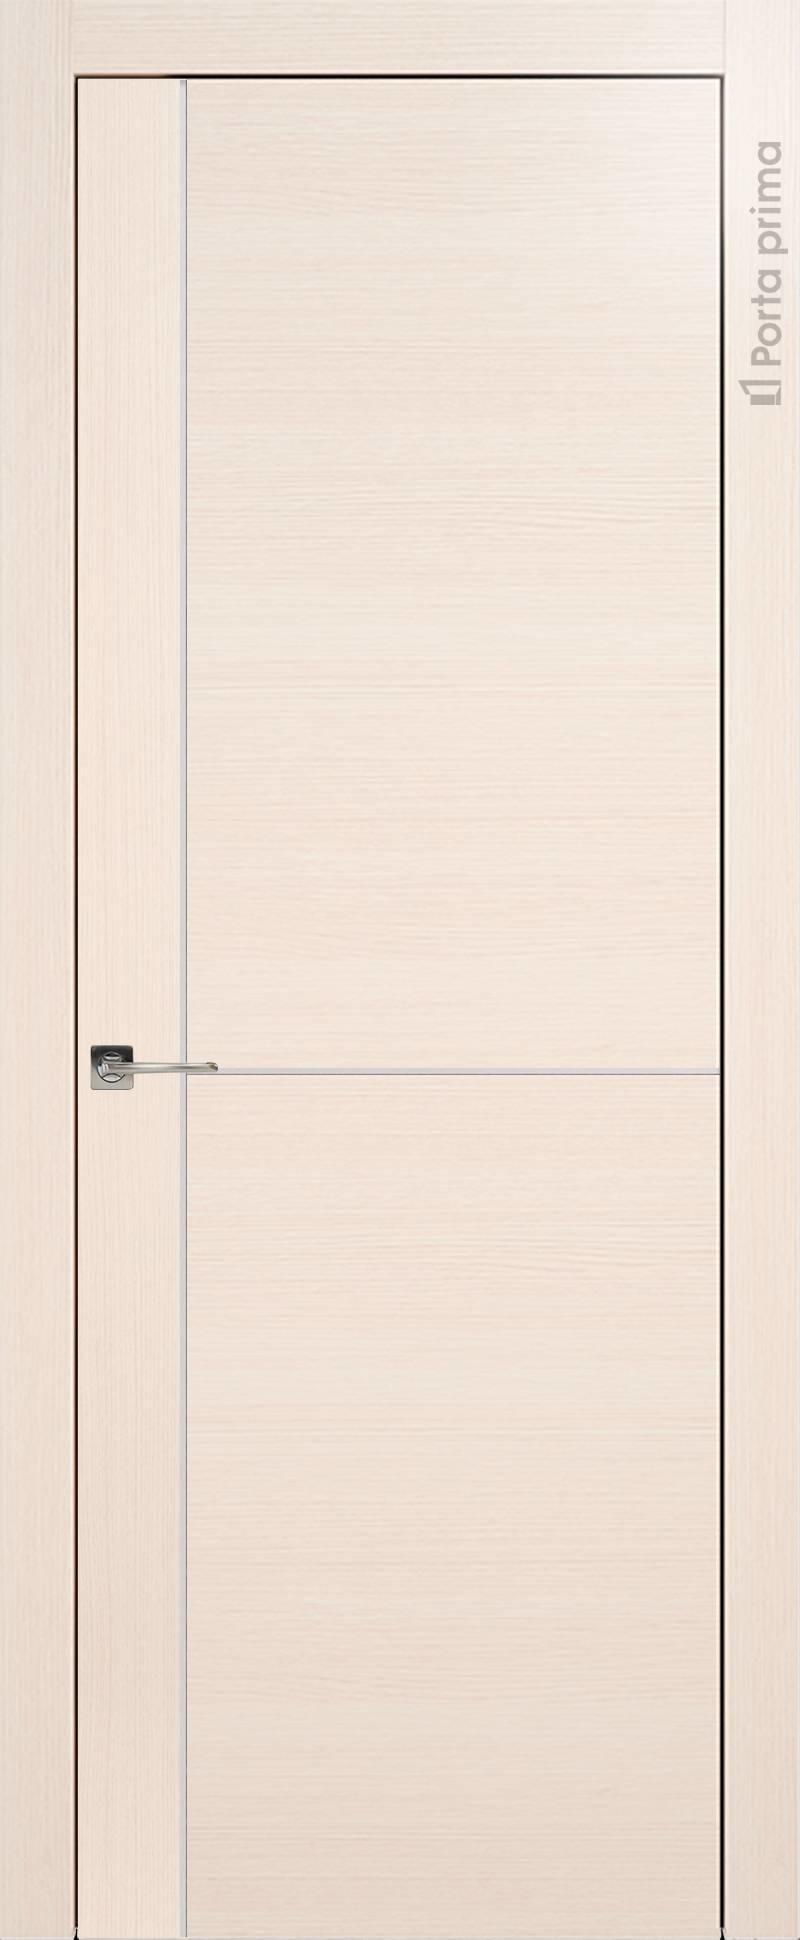 Tivoli Е-3 цвет - Беленый дуб Без стекла (ДГ)